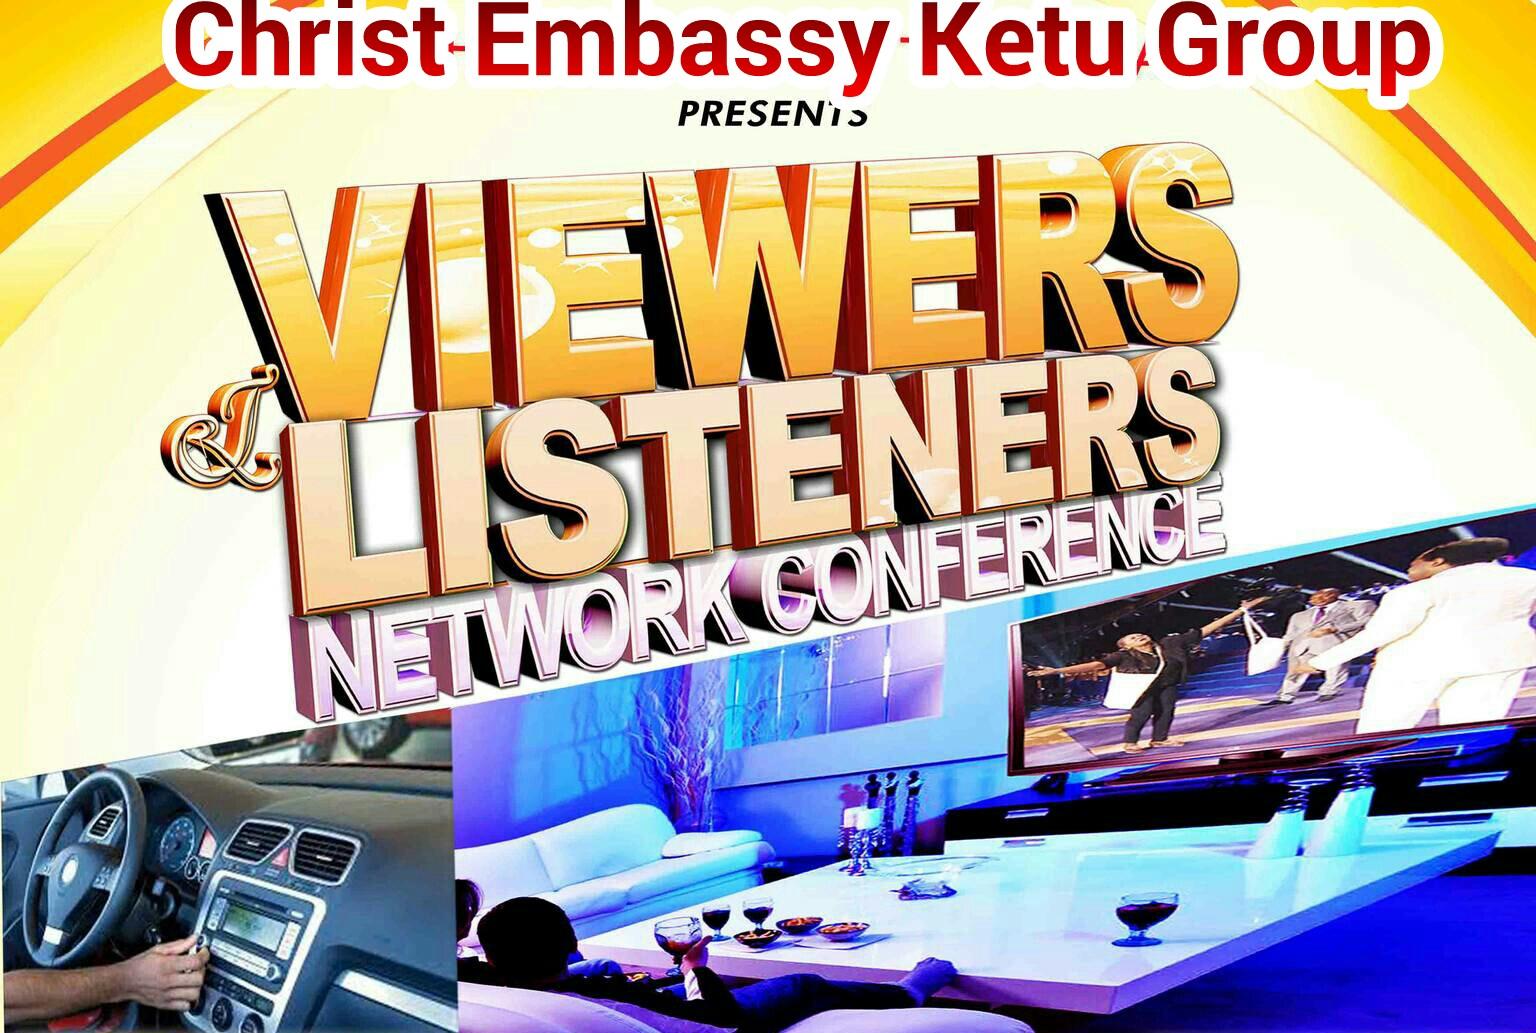 Christ Embassy KETU GROUP holds